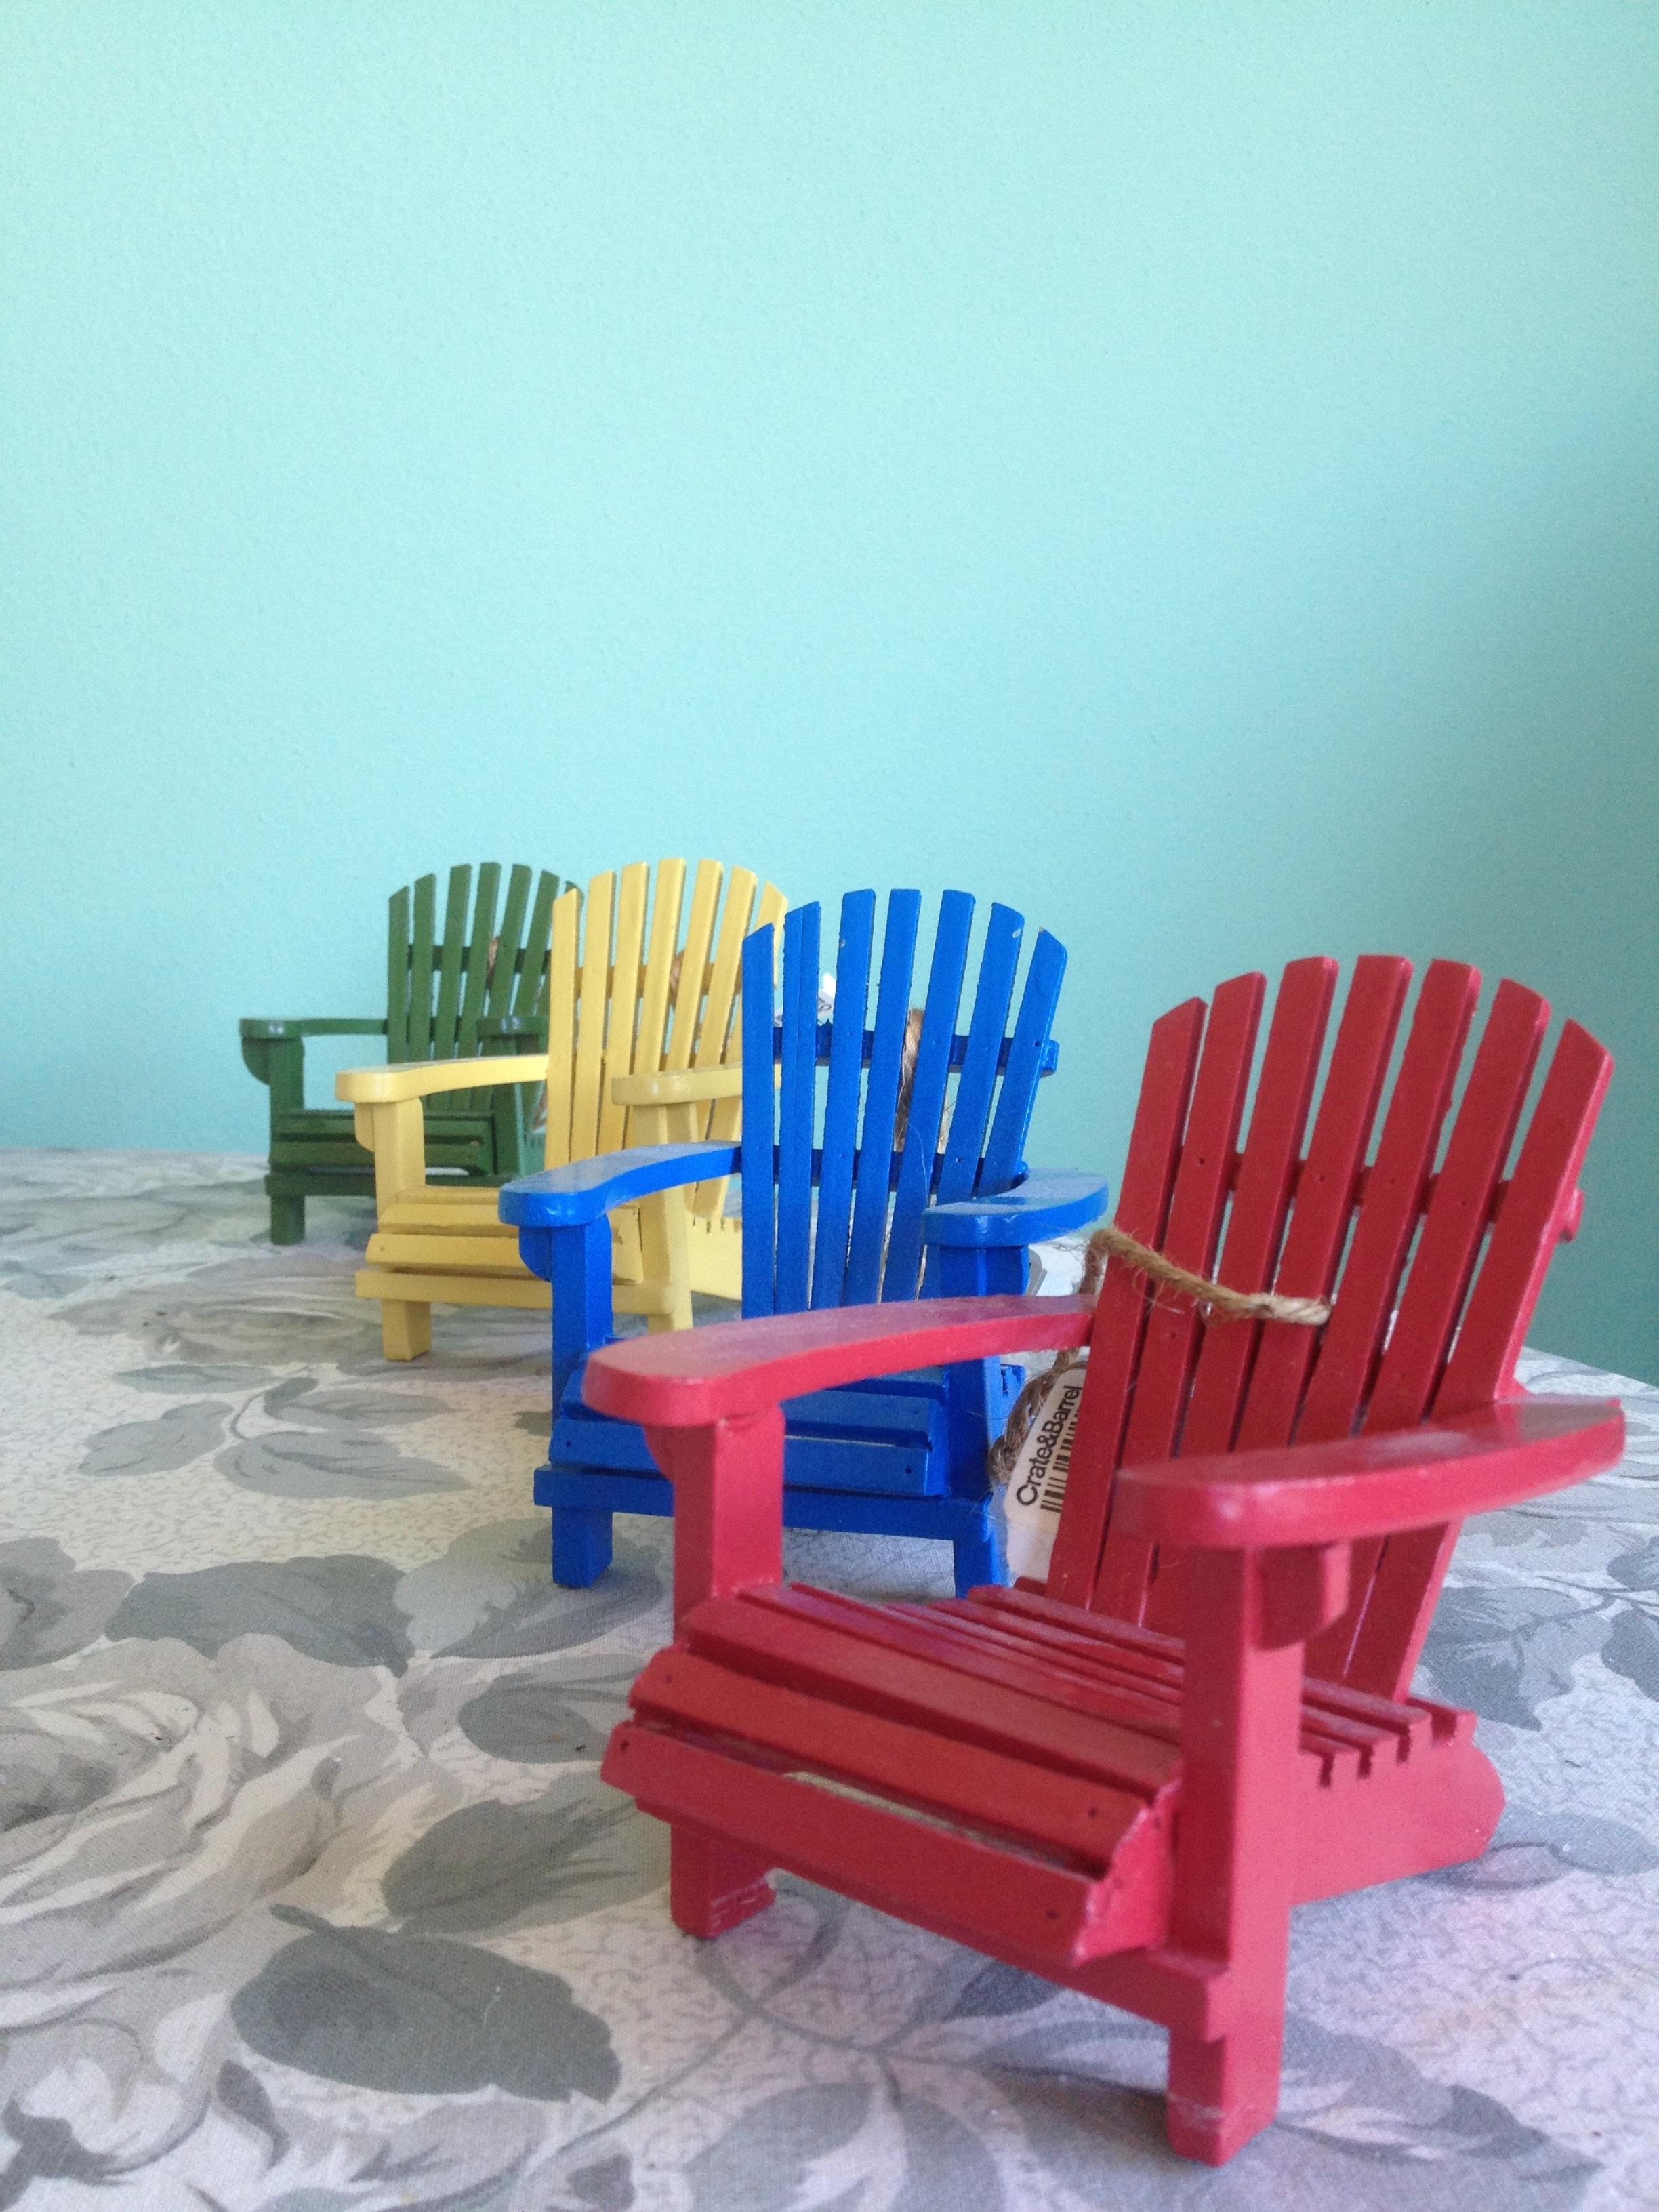 Fotos gratis : mesa, madera, jugar, silla, mueble, producto ...